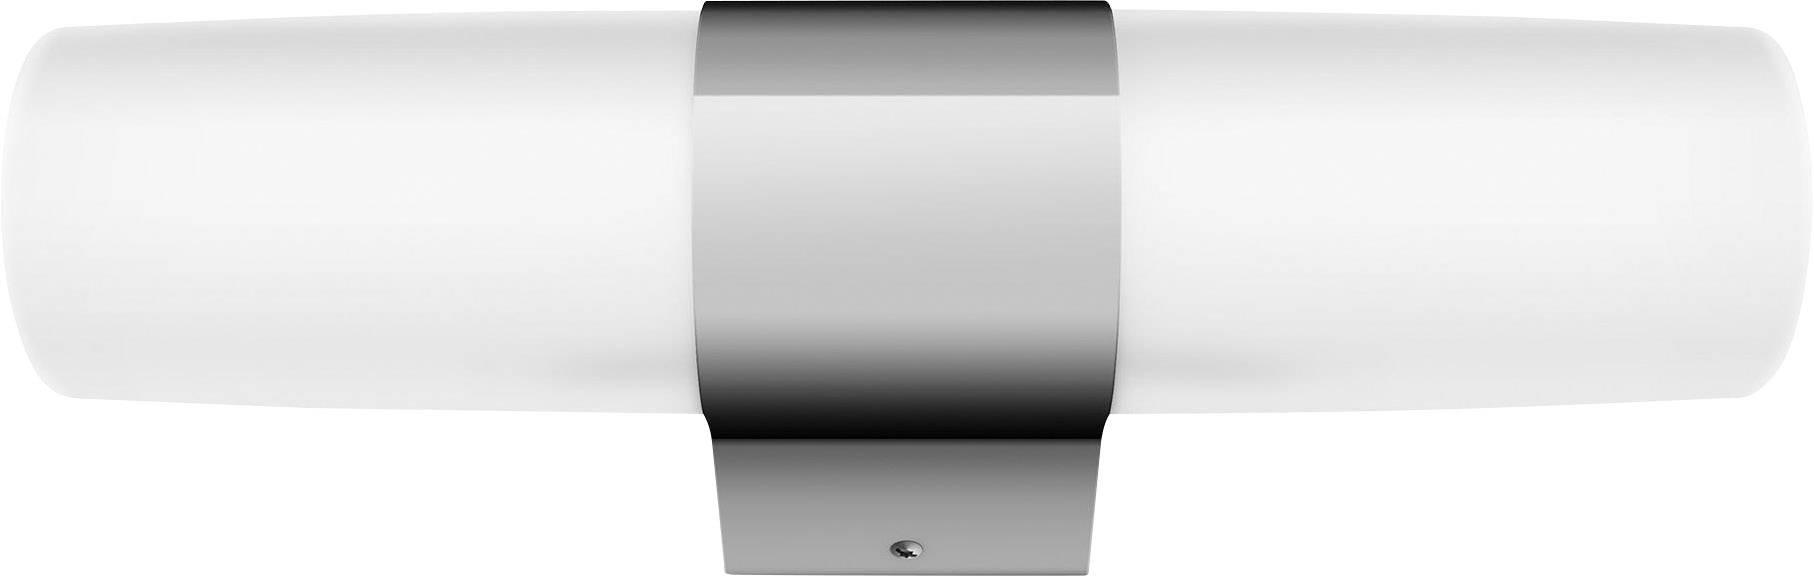 LED-badkamer wandlamp 6 W Warm-wit Philips Lighting 340241116 Skin ...